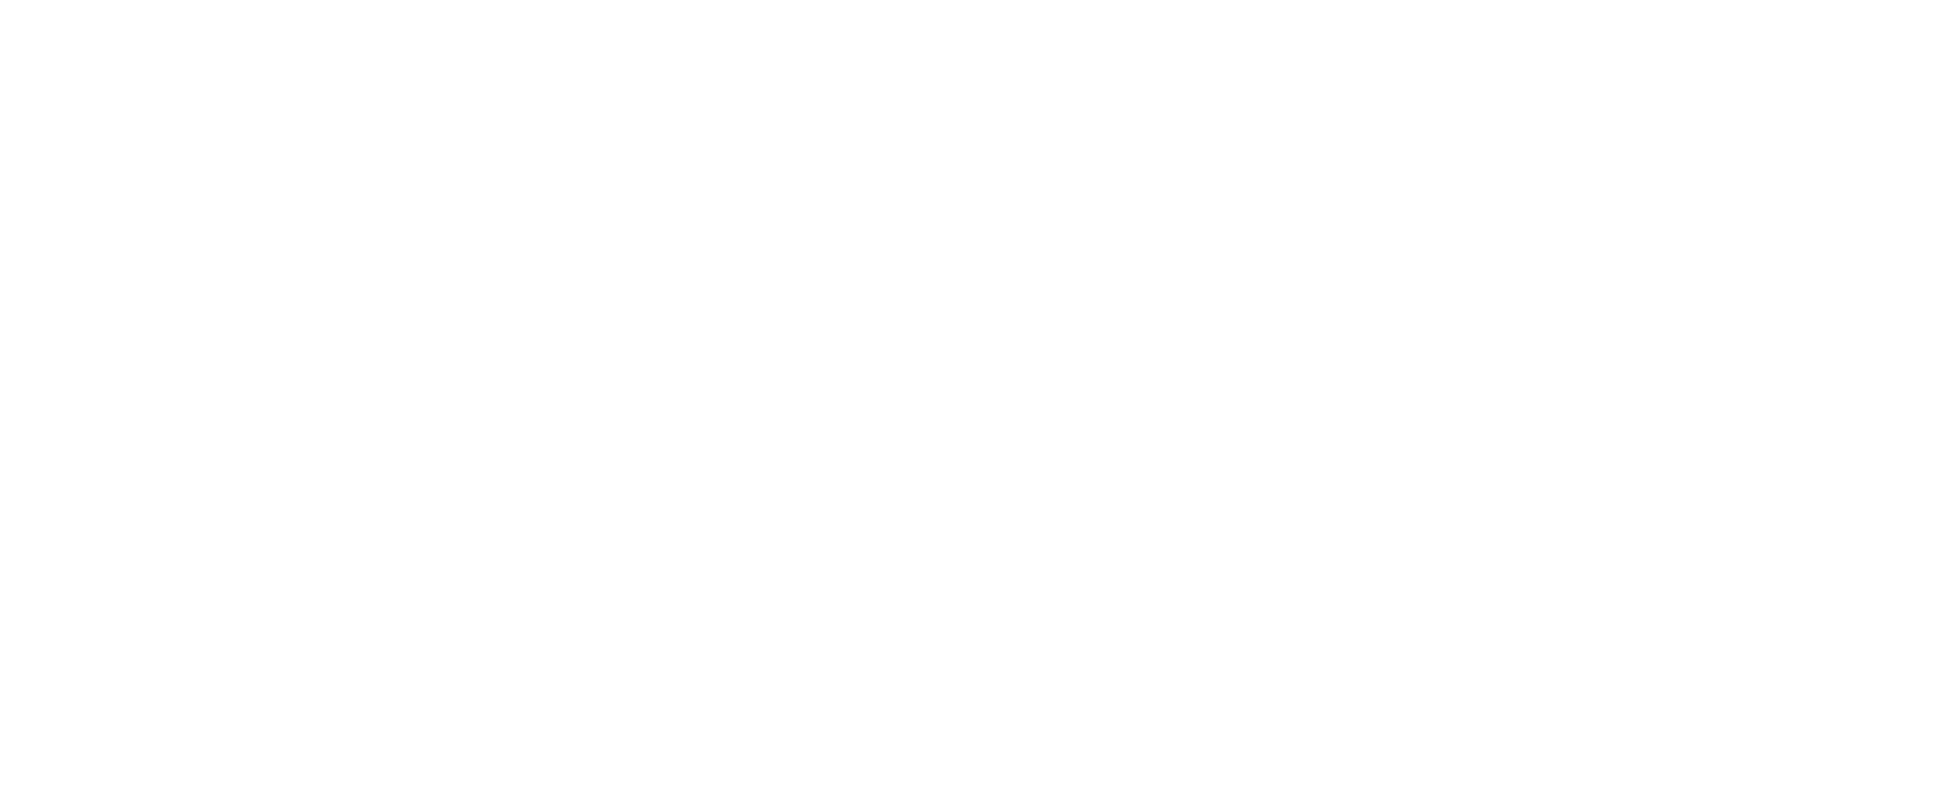 Liason Counseling Service